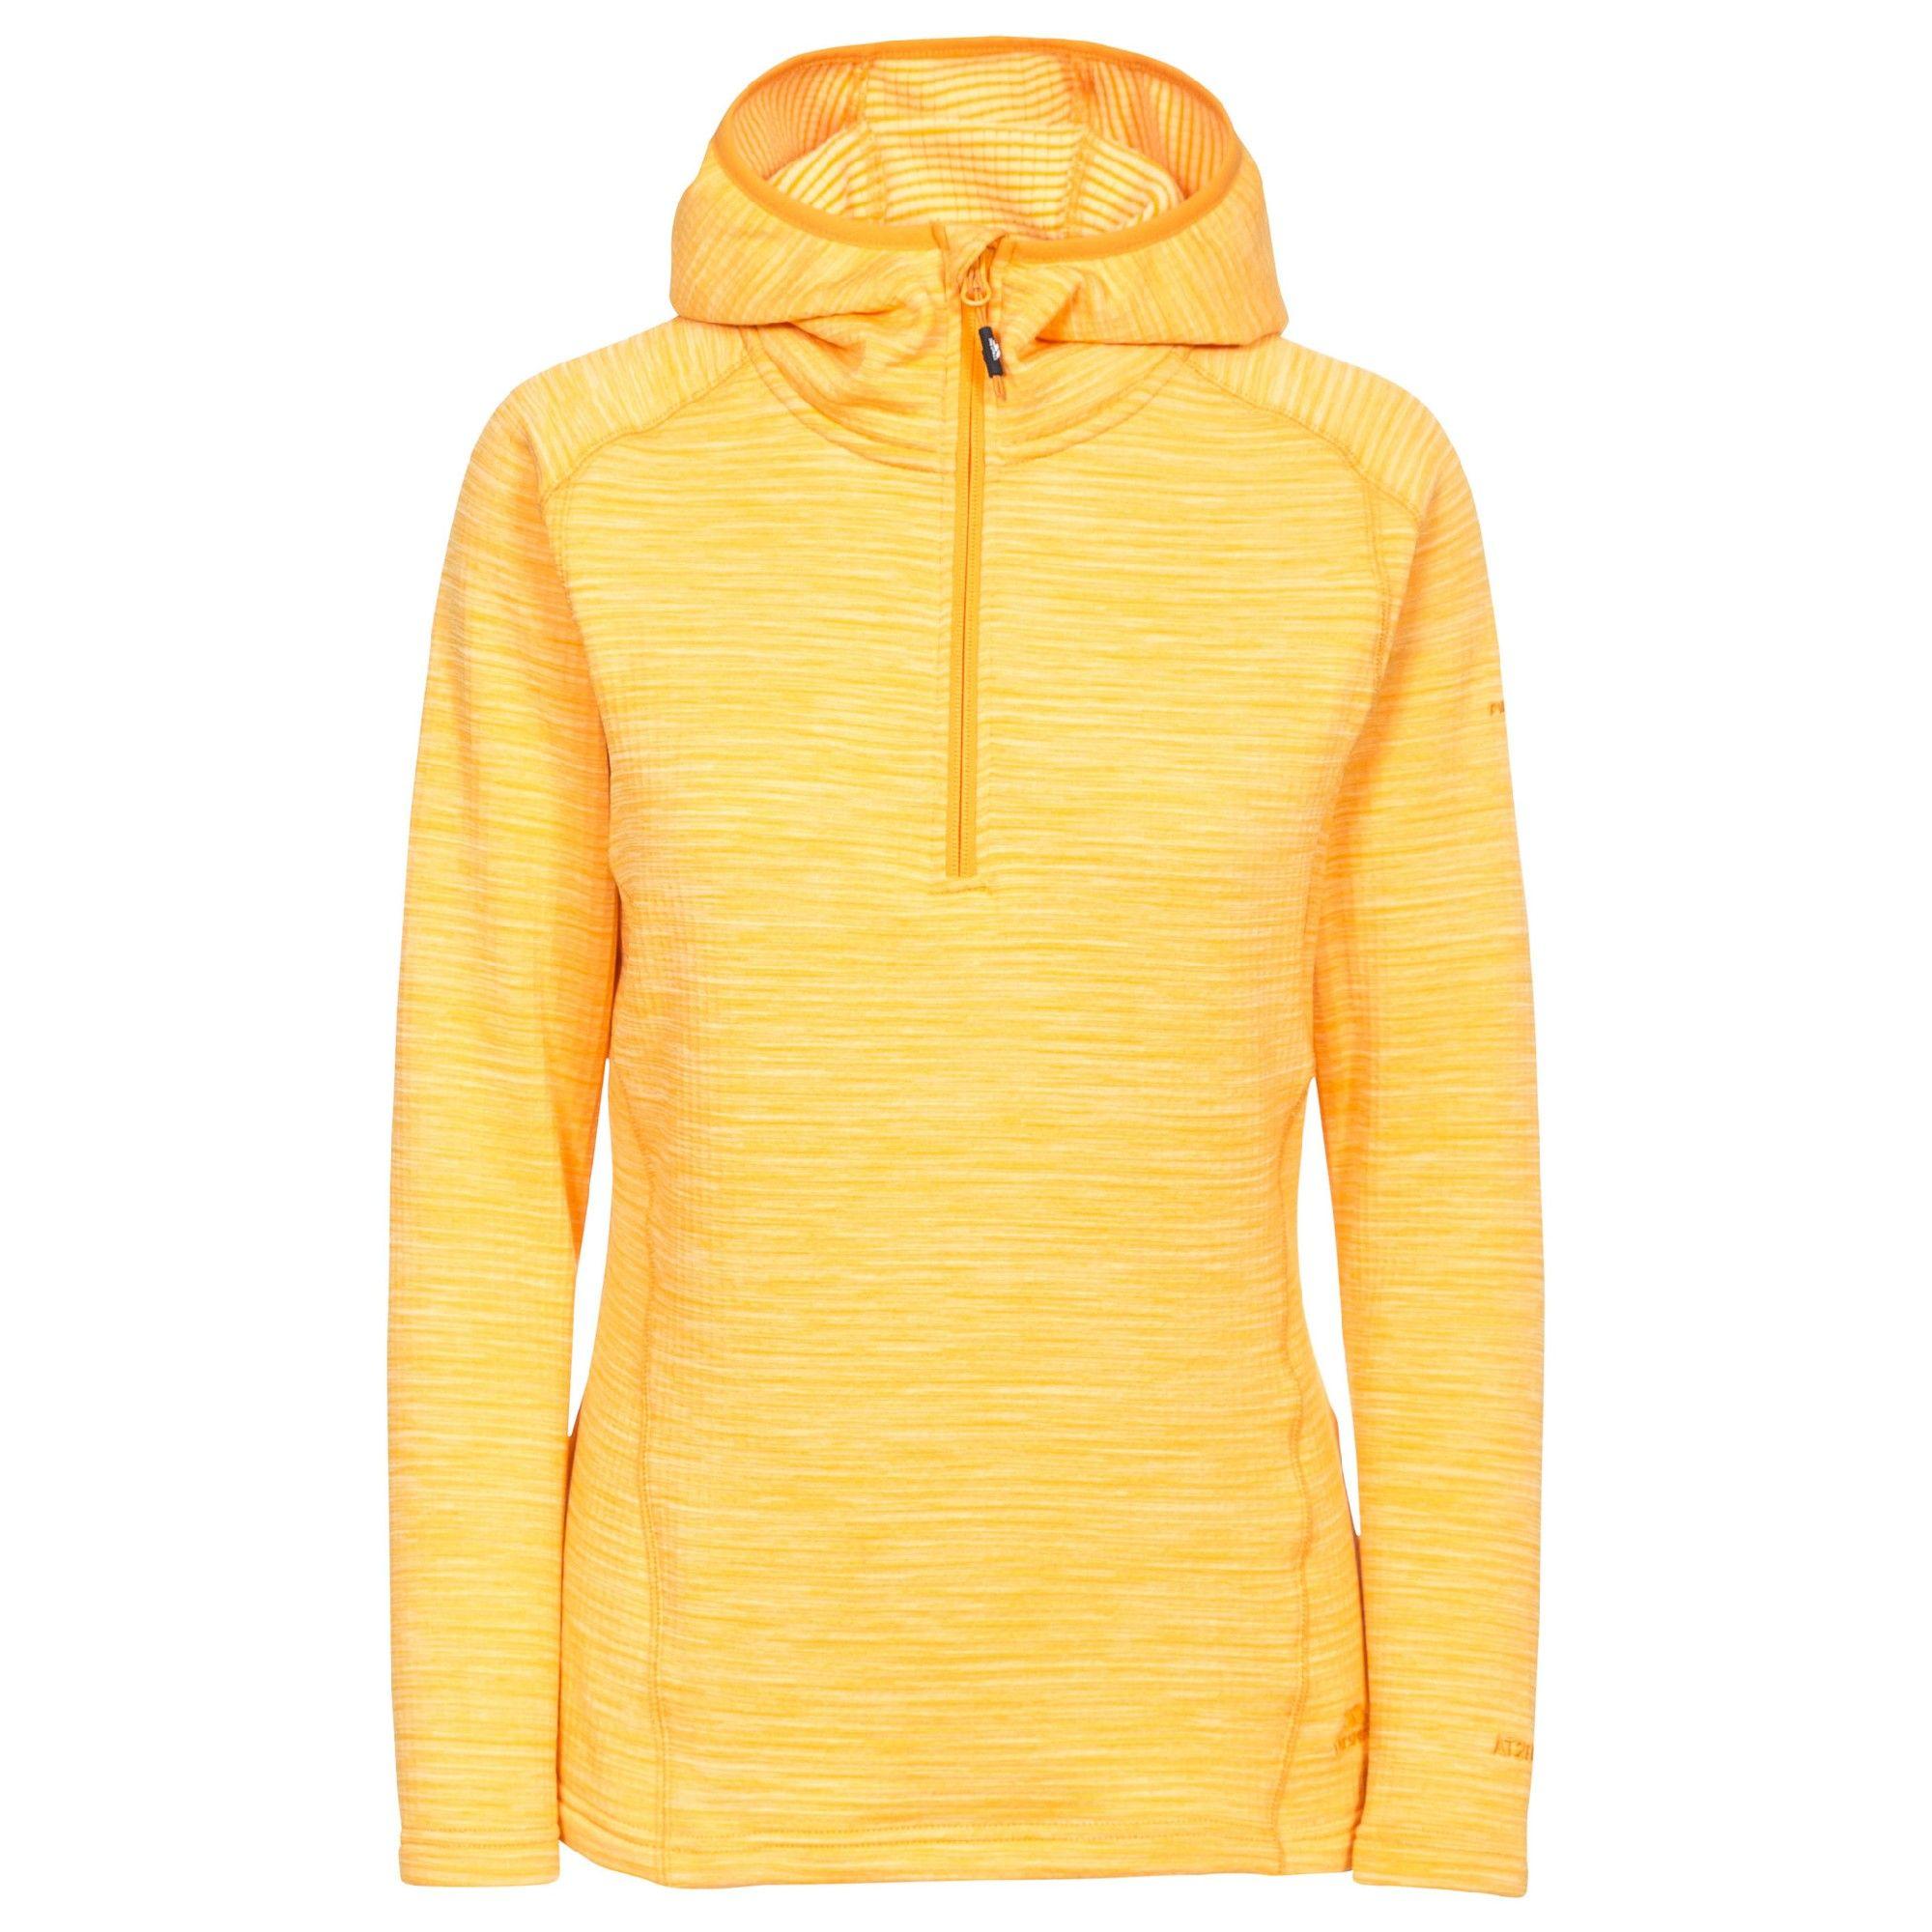 Trespass Womens/Ladies Romina Hooded Fleece Pullover